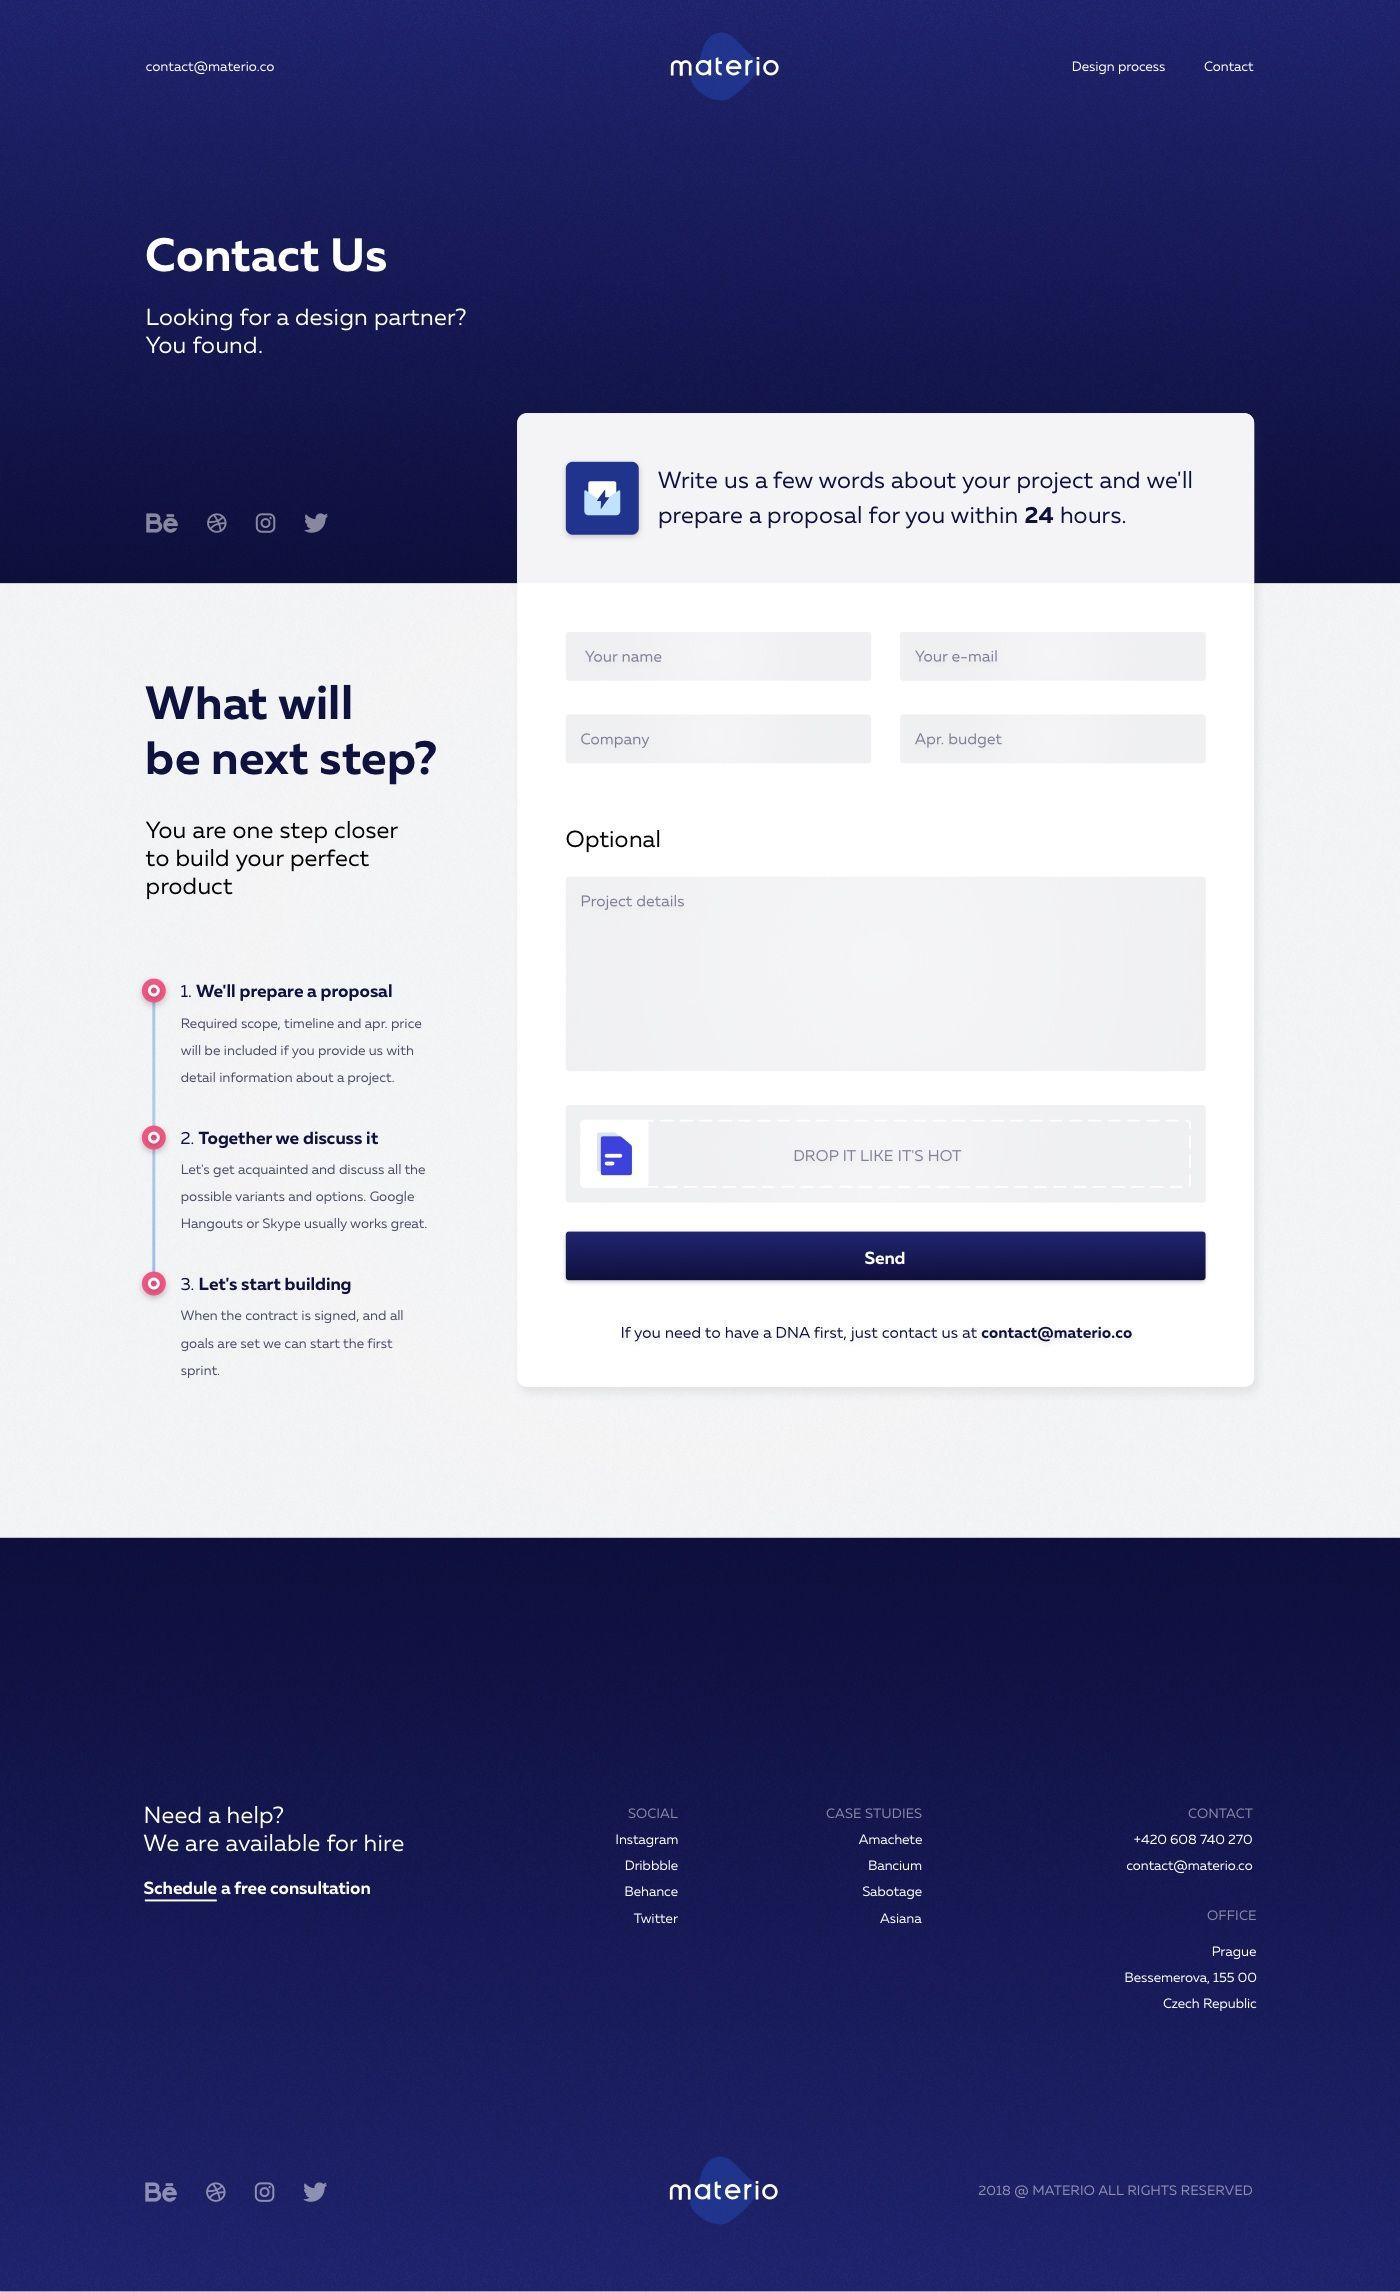 Contact Contact Us Page Design Simple Web Design Web Design